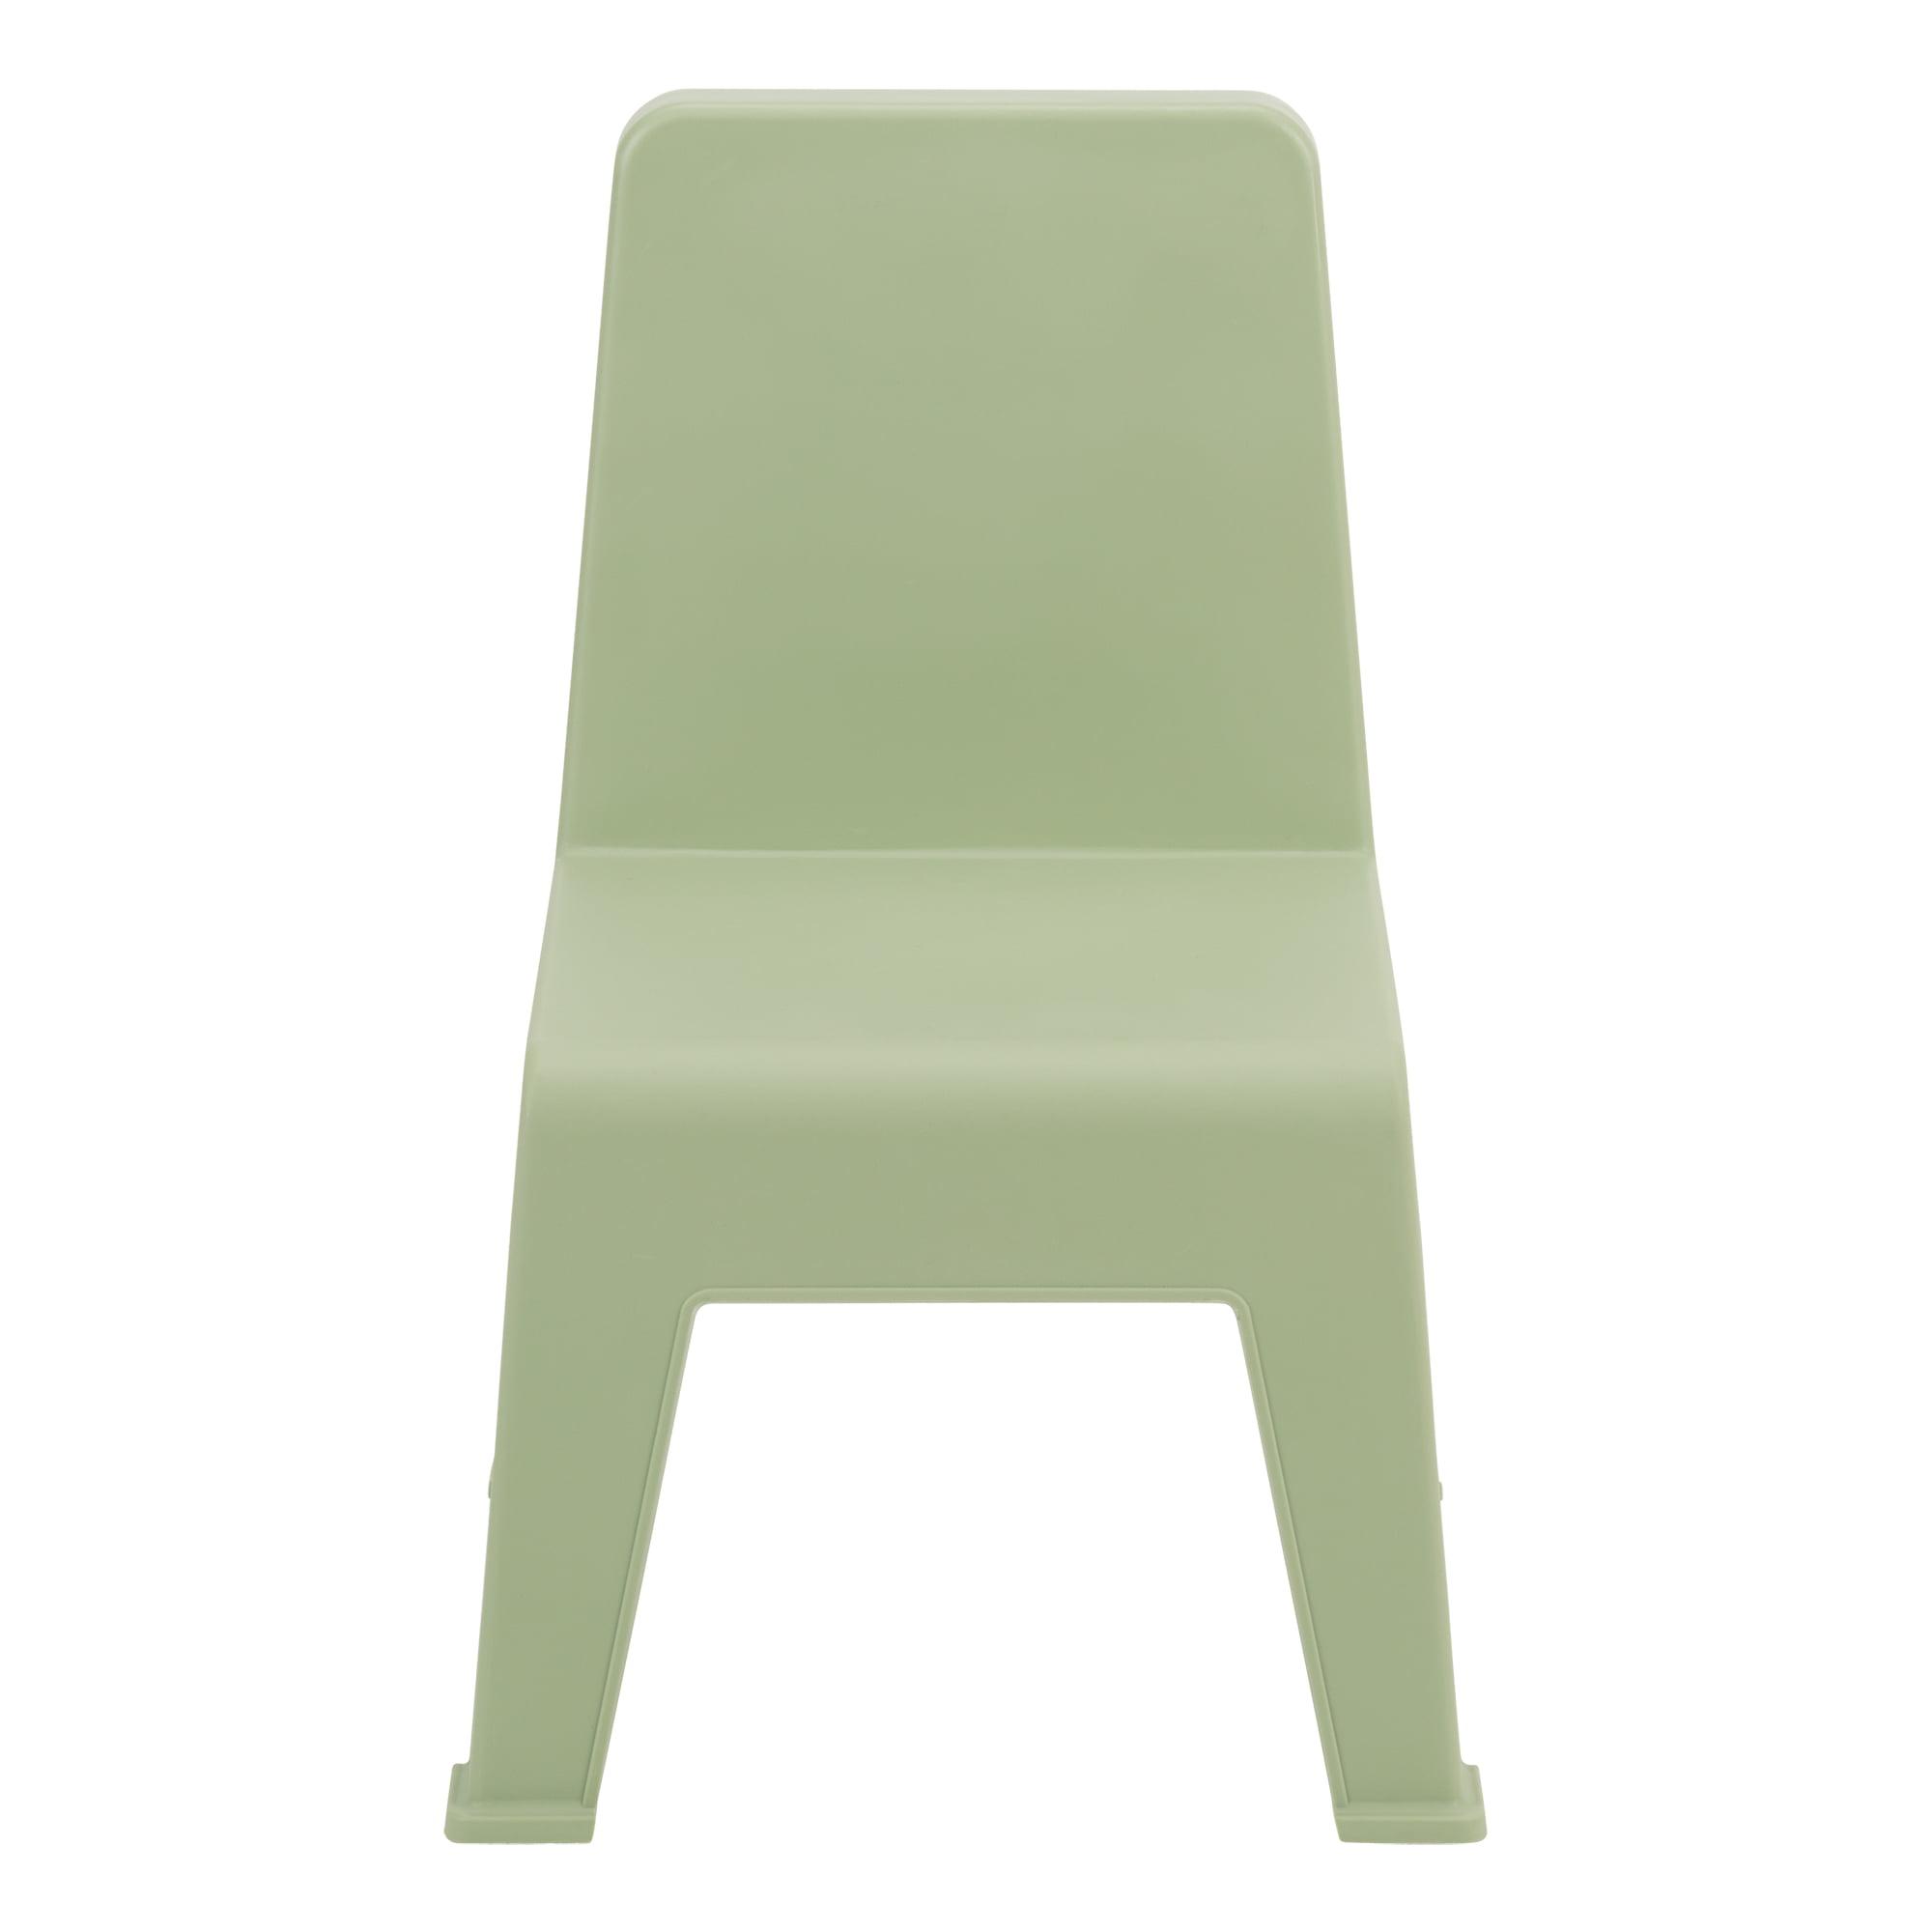 Phenomenal Sprogs Nesting Chair Green Pack Of 2 Lamtechconsult Wood Chair Design Ideas Lamtechconsultcom